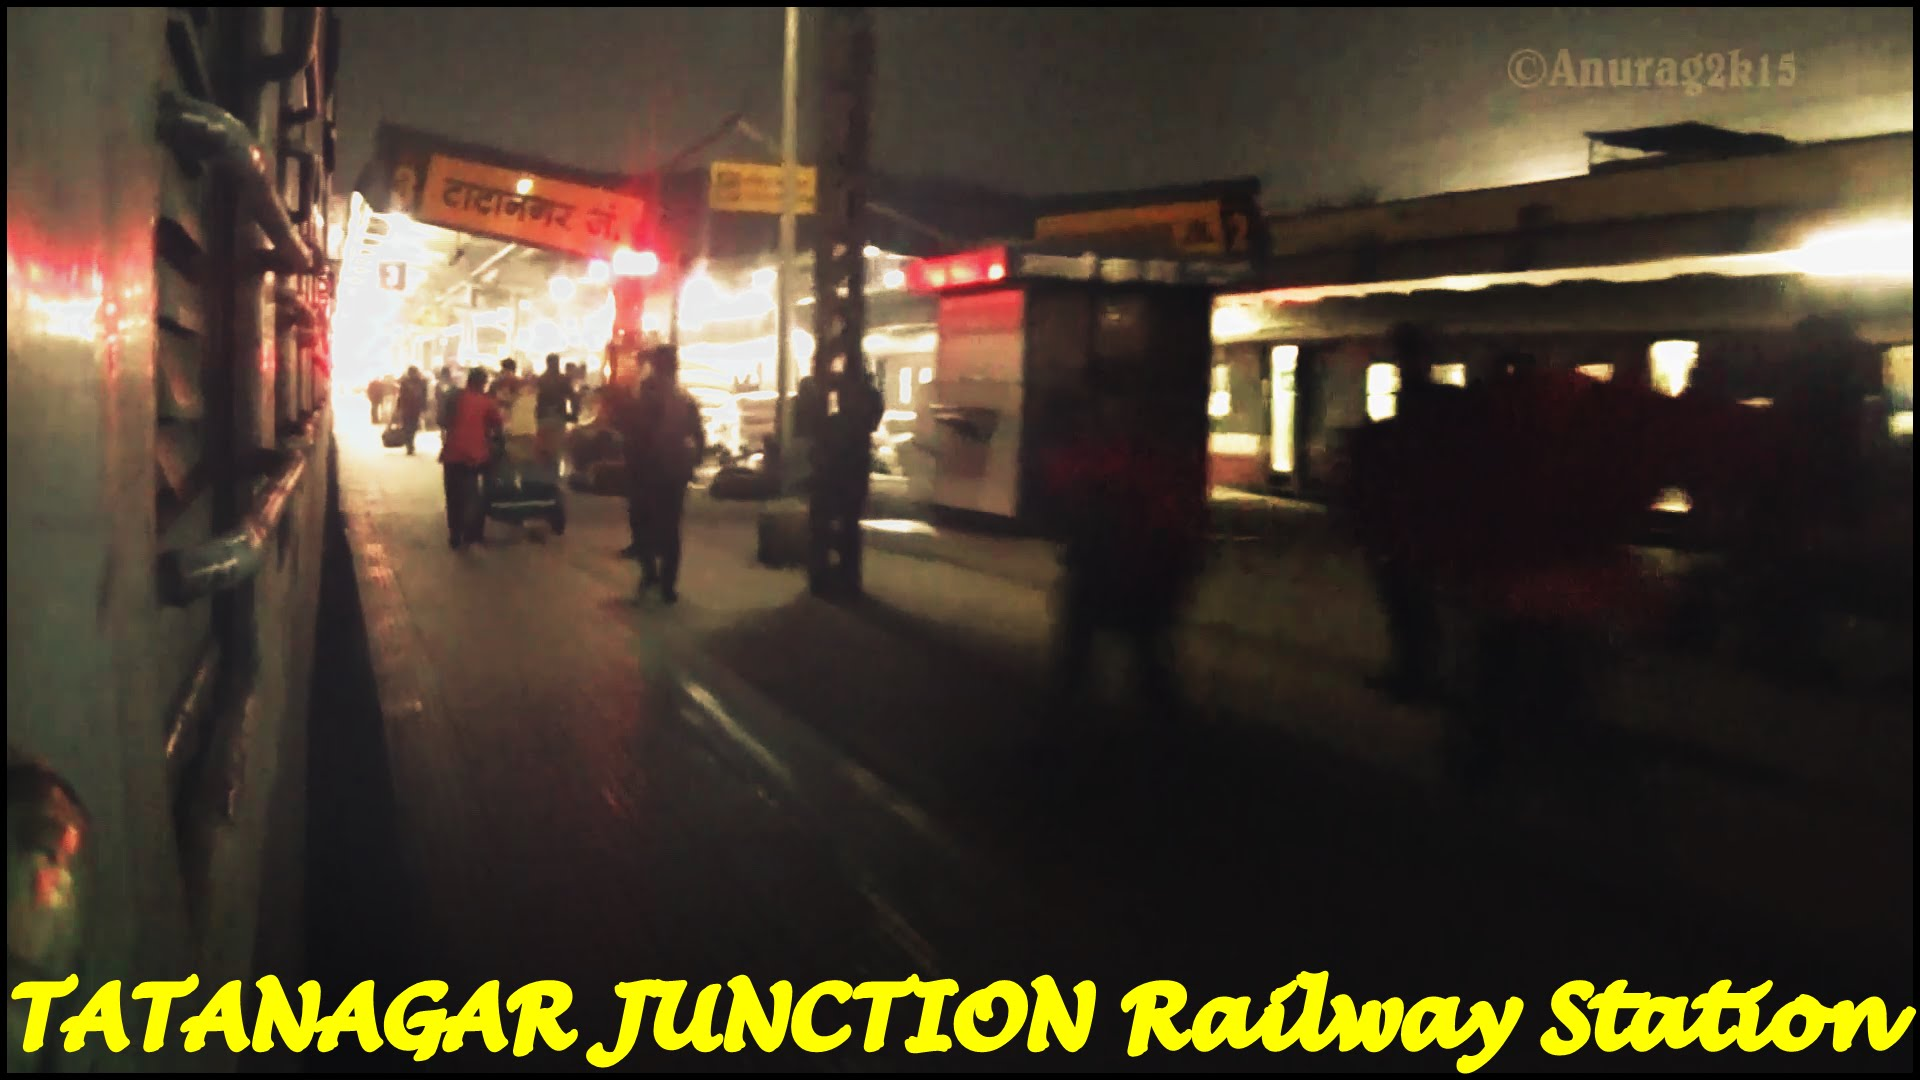 Indian Railways..Late night departure from TATANAGAR JUNCTION.